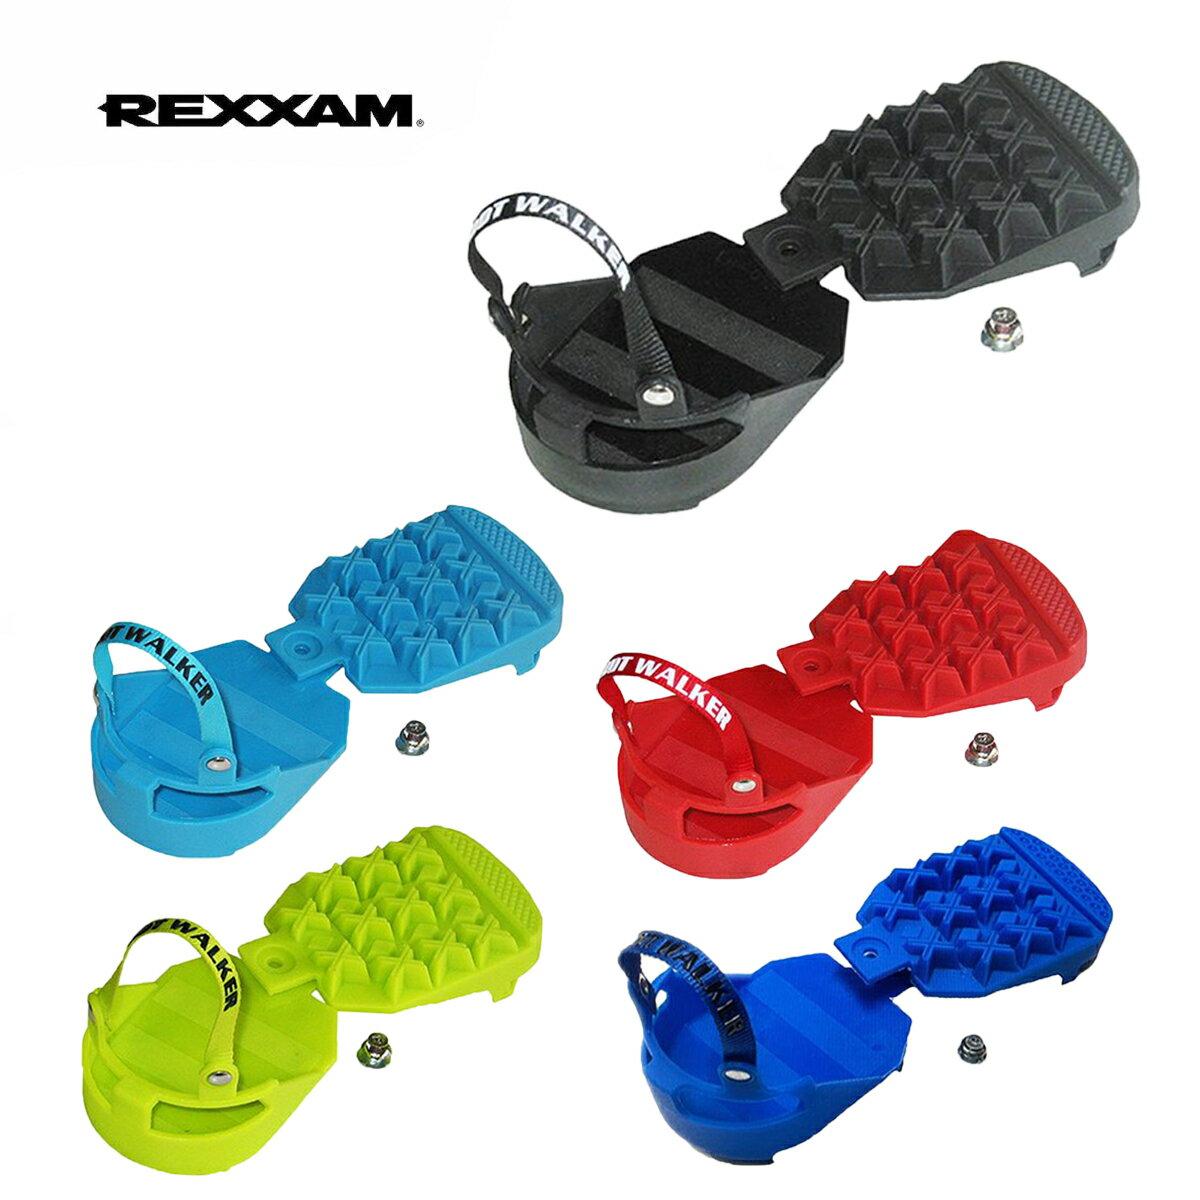 ★REXXAM〔レクザム〕ブーツソールプロテクター FOOT WALKER〔フットウォーカー〕【isyo】【SOLPR】